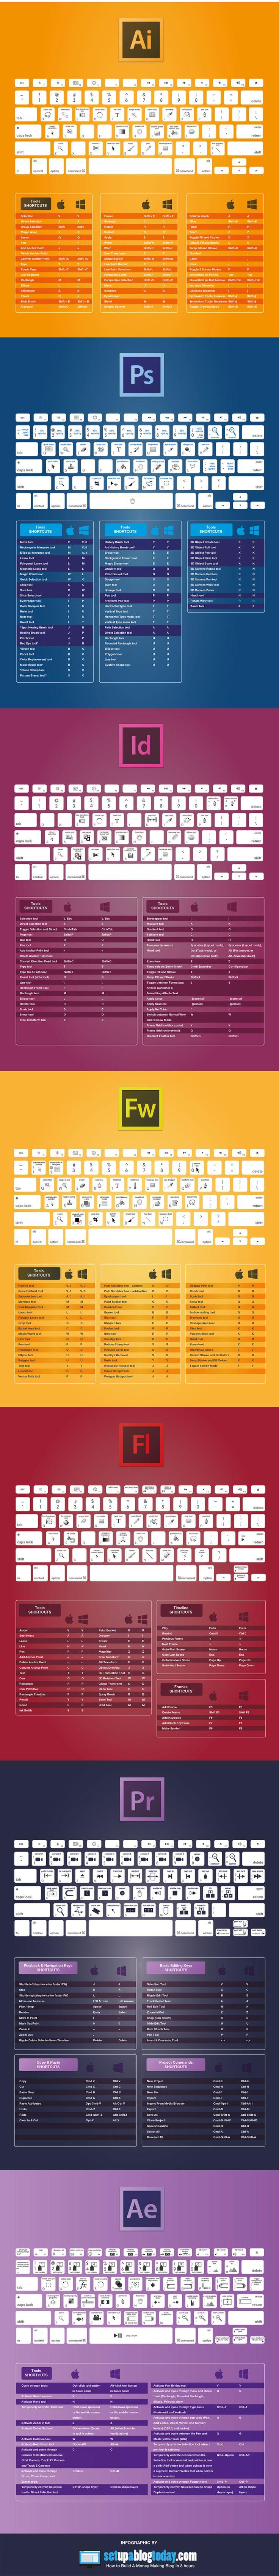 Adobe CC Keyboard Shortcuts Cheat Sheet [Infographic]